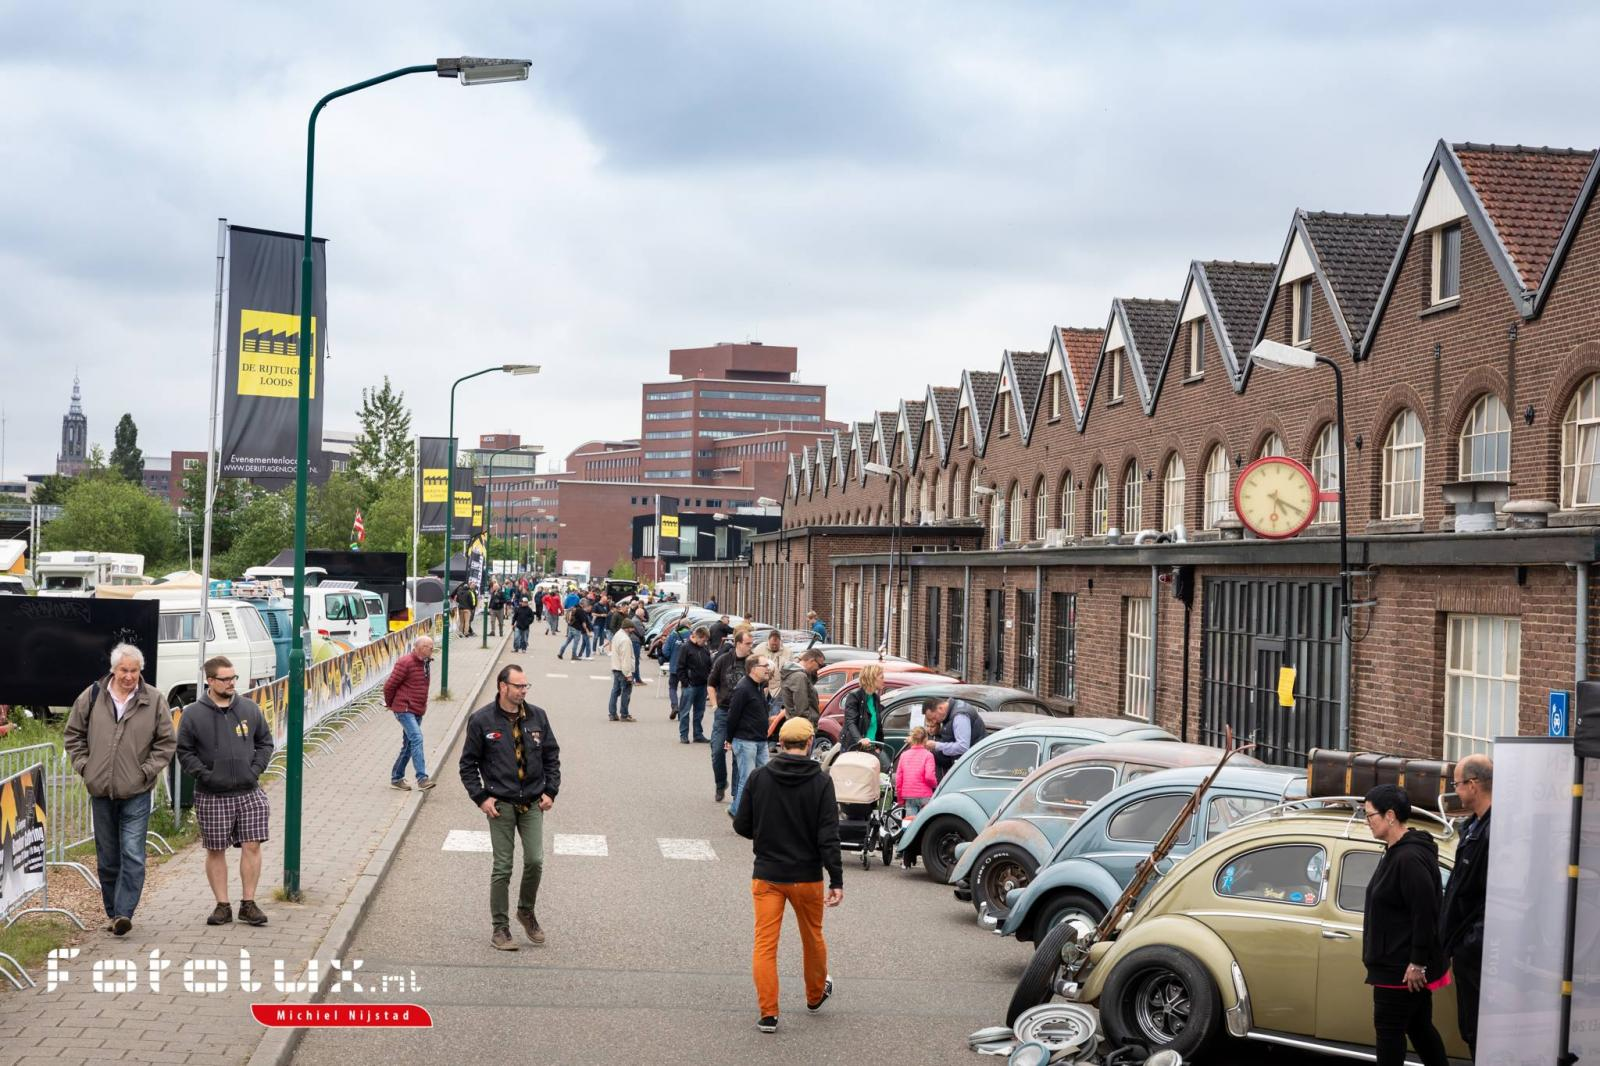 2nd European Barndoor Gathering & Vintage VW Show | 19-20 May 2018